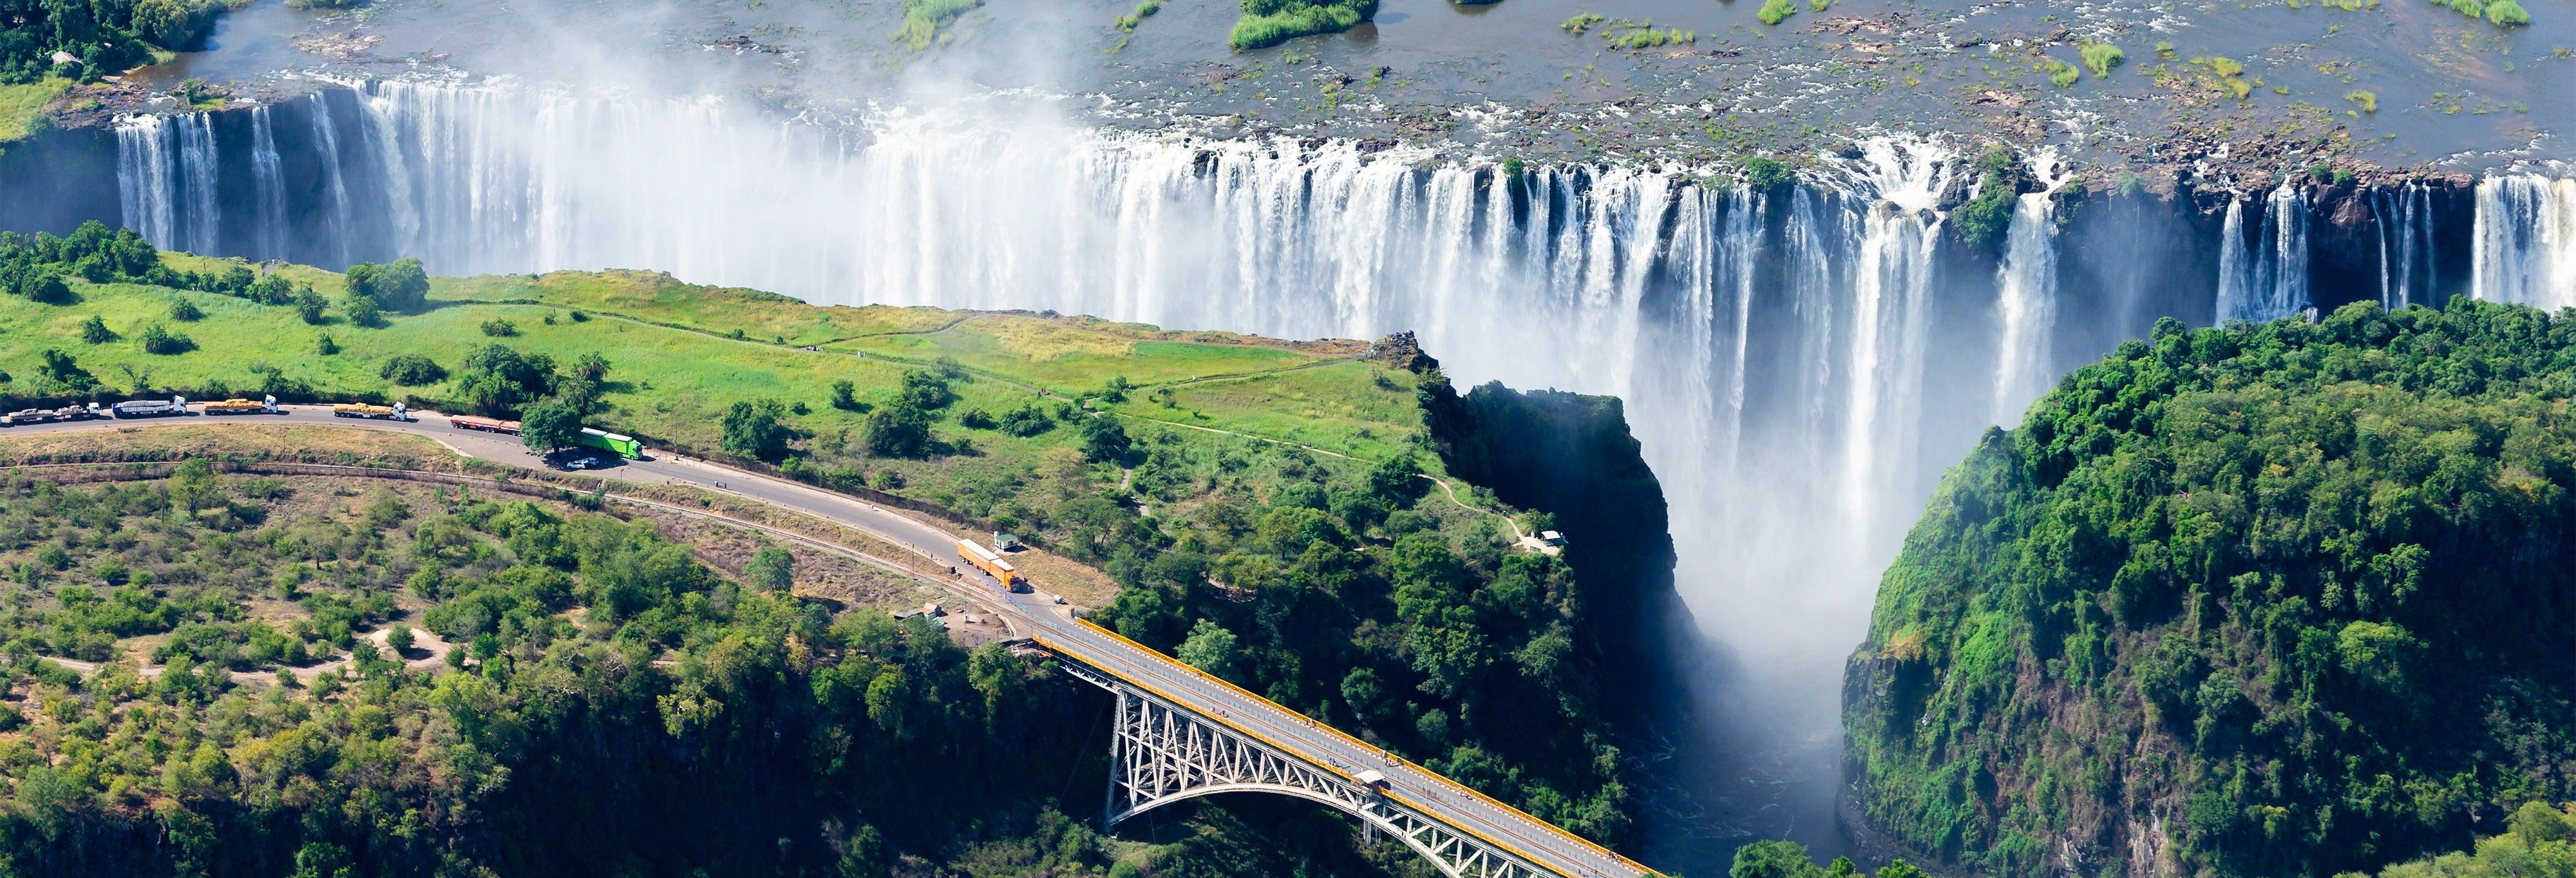 Gorge swing a Victoria Falls